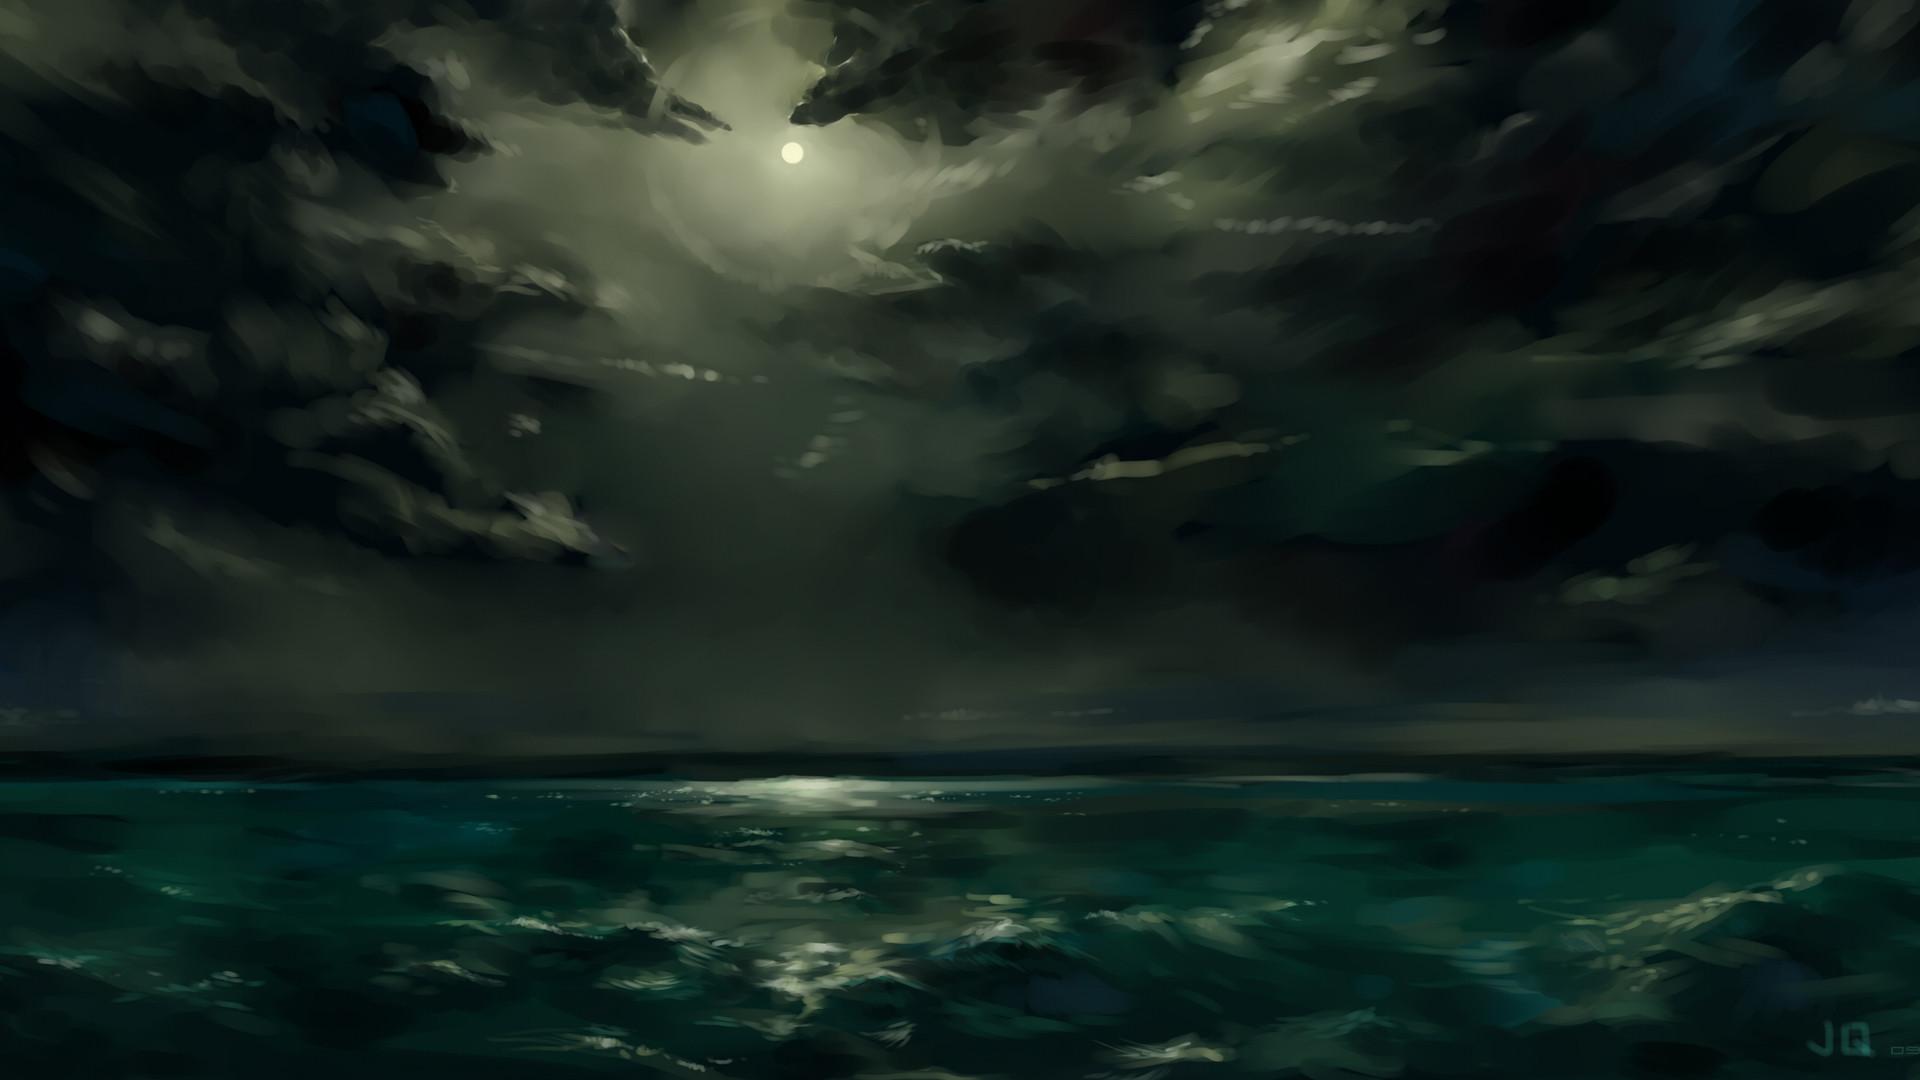 Clouds night storm sea wallpaper     217848   WallpaperUP